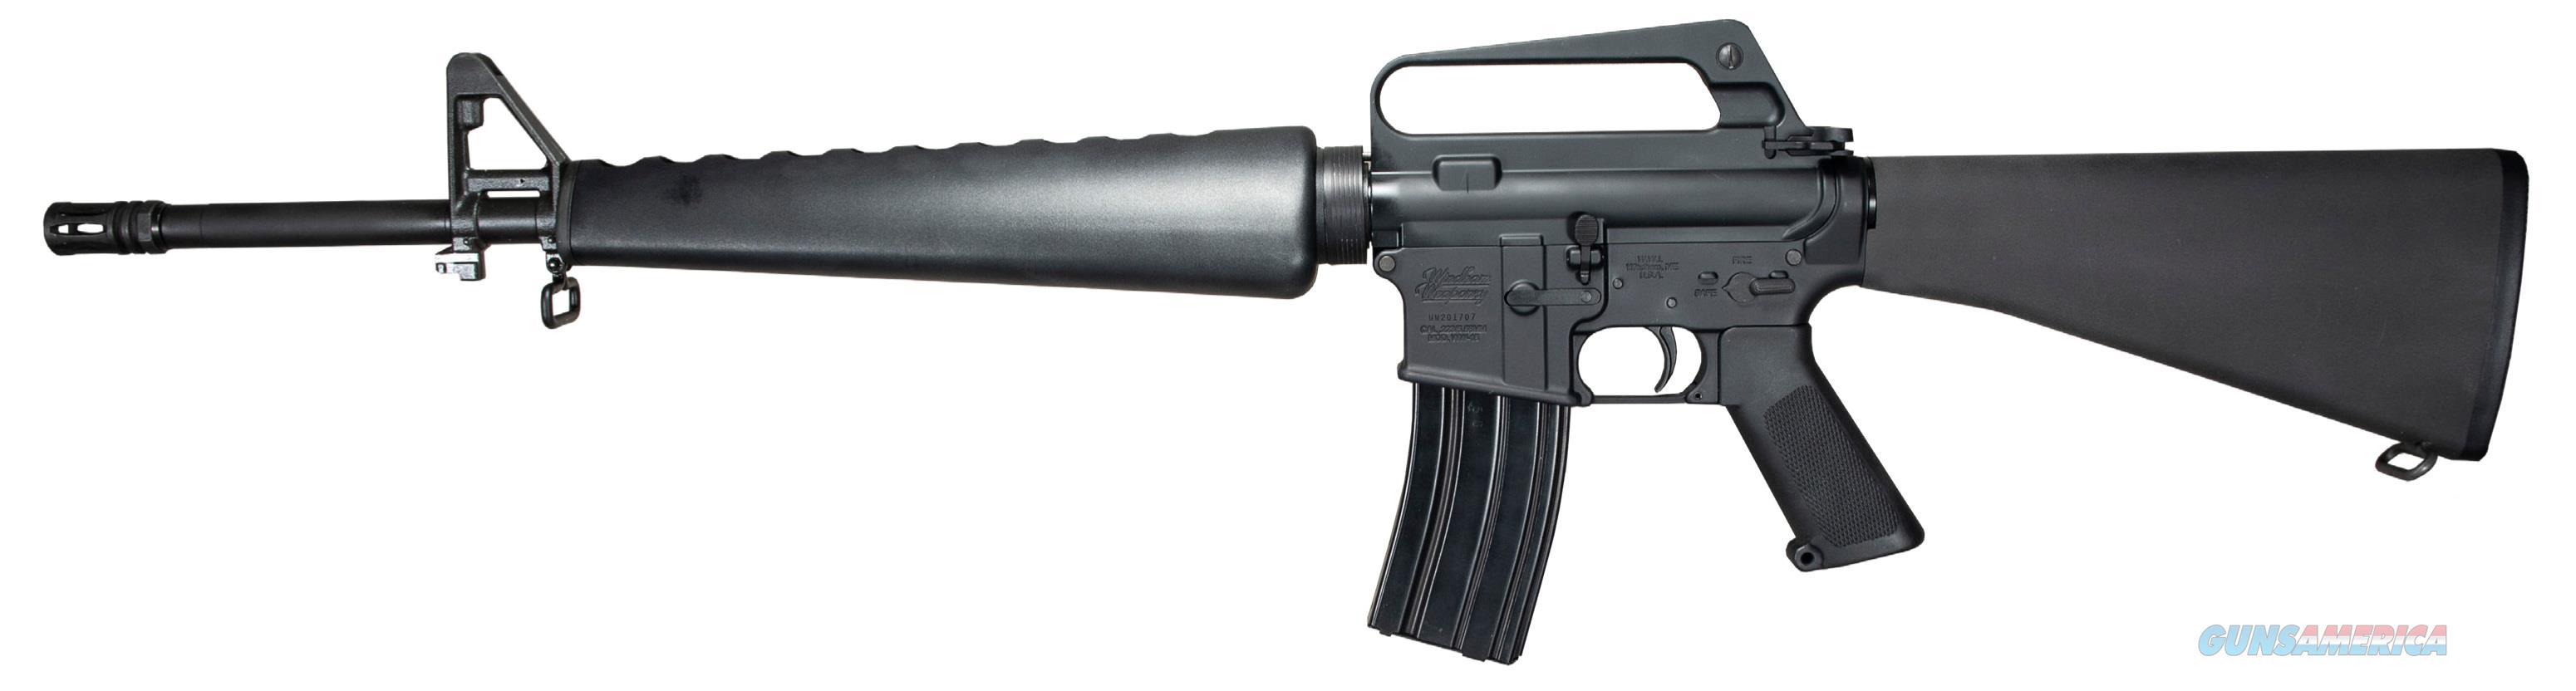 "Windham Weaponry Vietnam Era Retro Rifle, M4A2, 5.56Nato, 20"" $925 NIB  Guns > Rifles > Windham Weaponry Rifles"